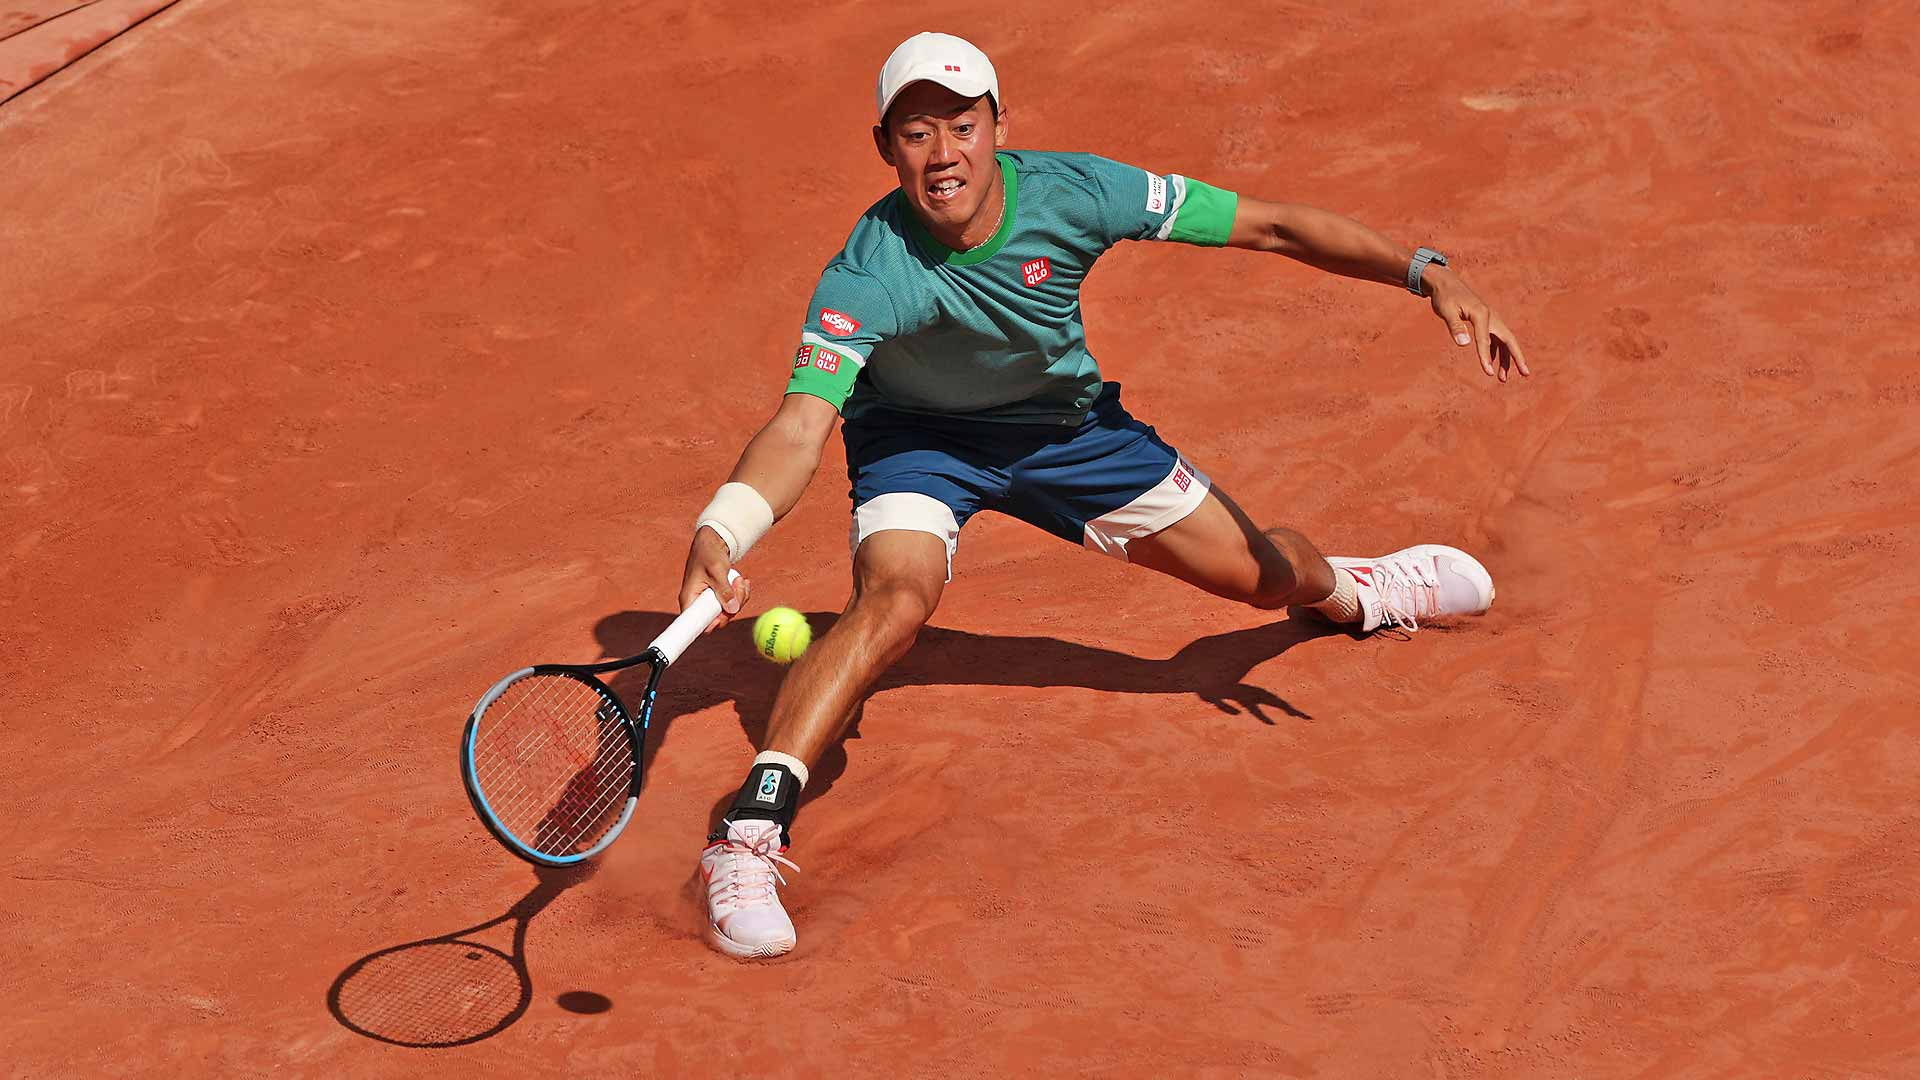 Roland Garros 2021: Karen Khachanov vs. Kei Nishikori Tennis Pick and Prediction